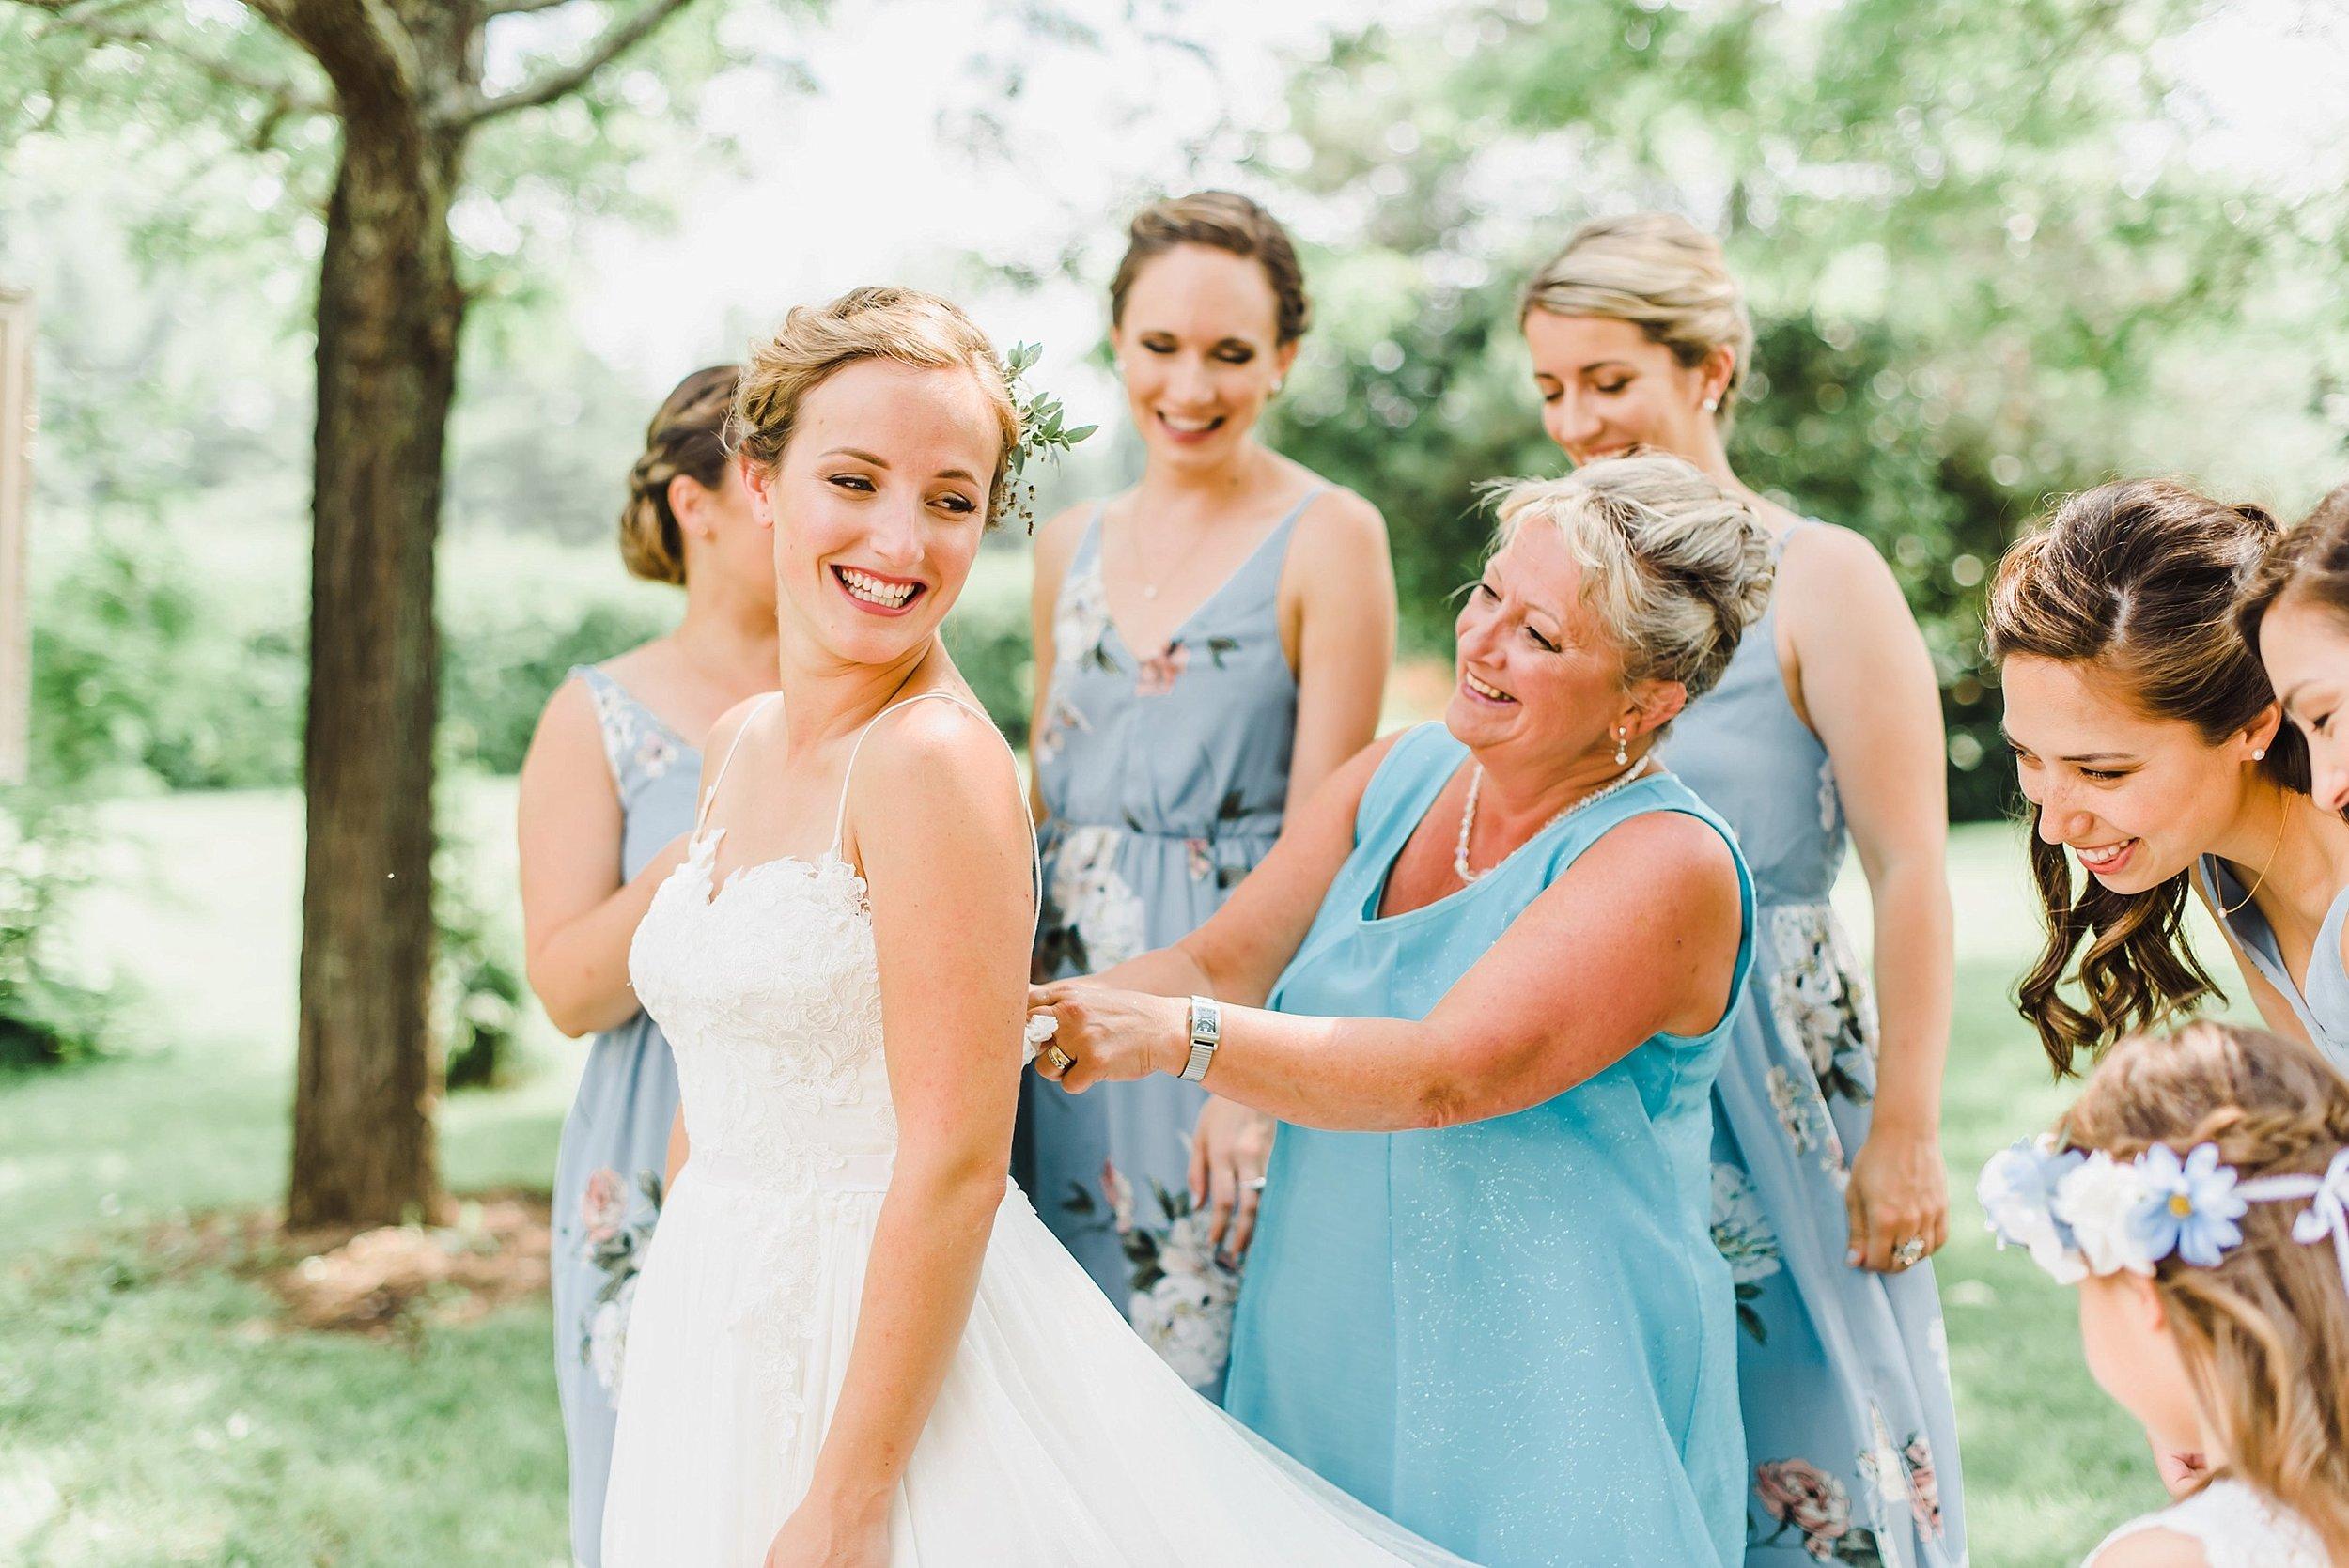 light airy indie fine art ottawa wedding photographer | Ali and Batoul Photography_0788.jpg